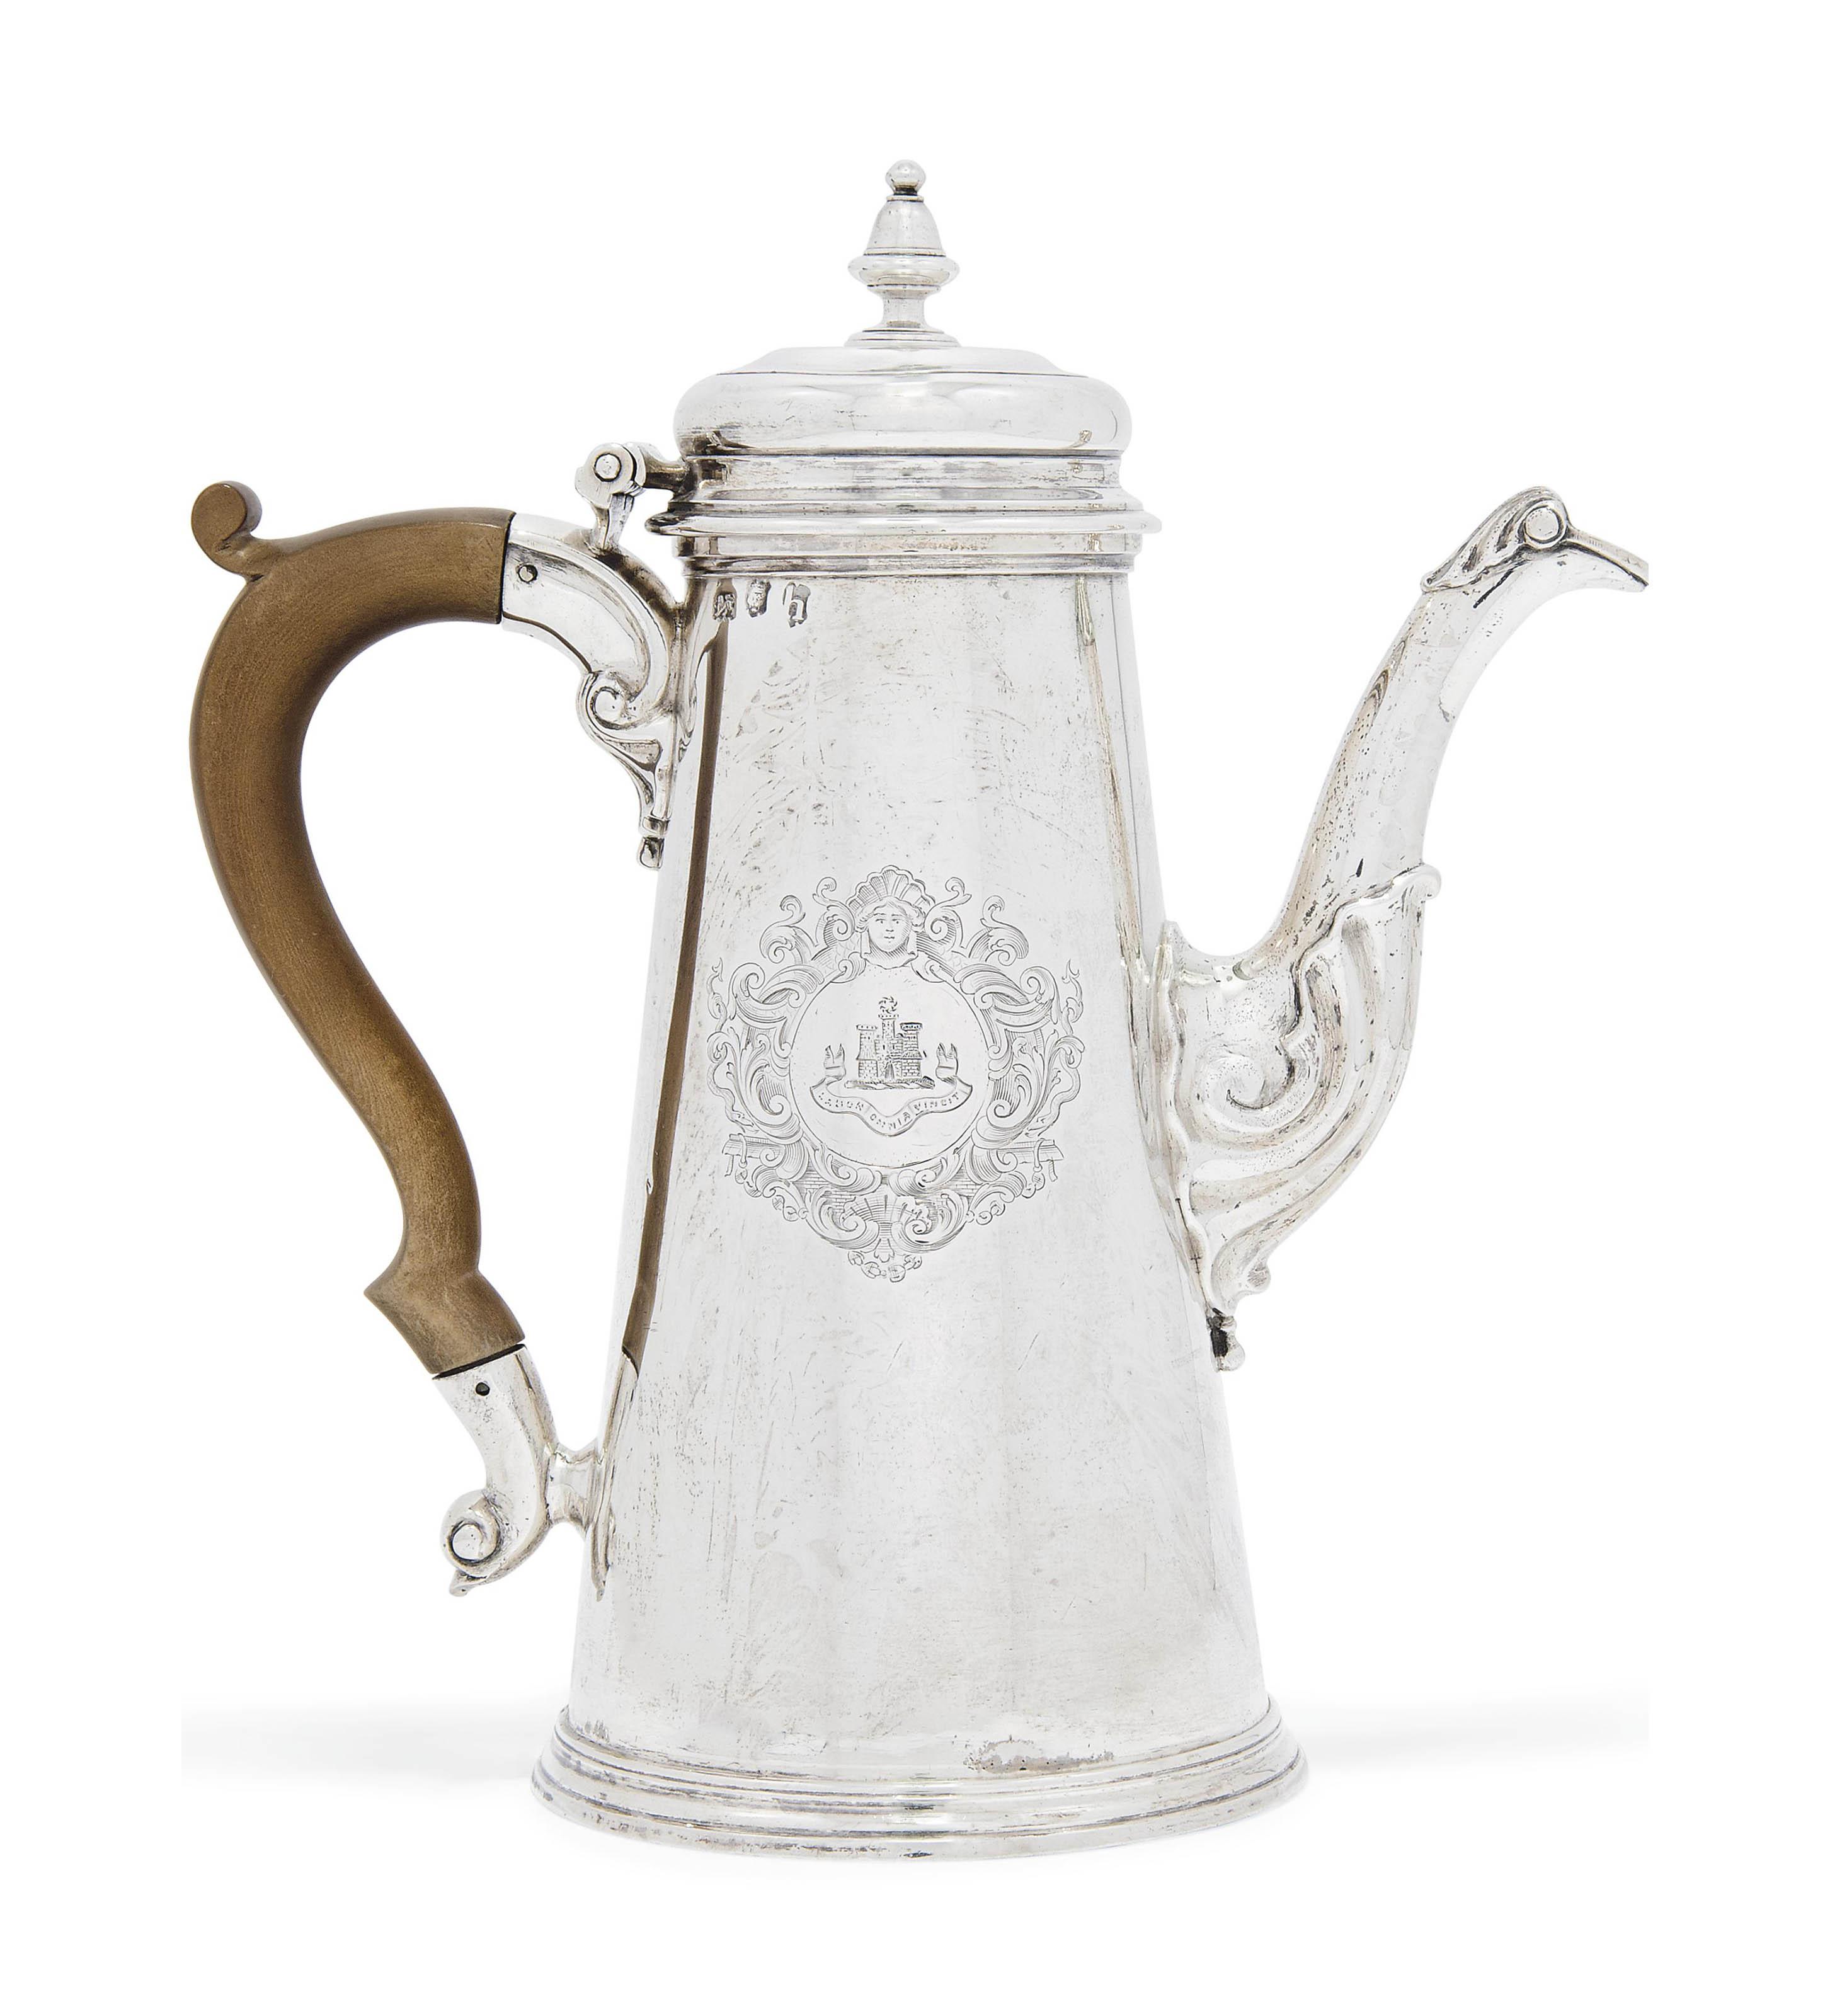 A GEORGE II SILVER COFFEE POT , MARK OF JOHN SWIFT, LONDON